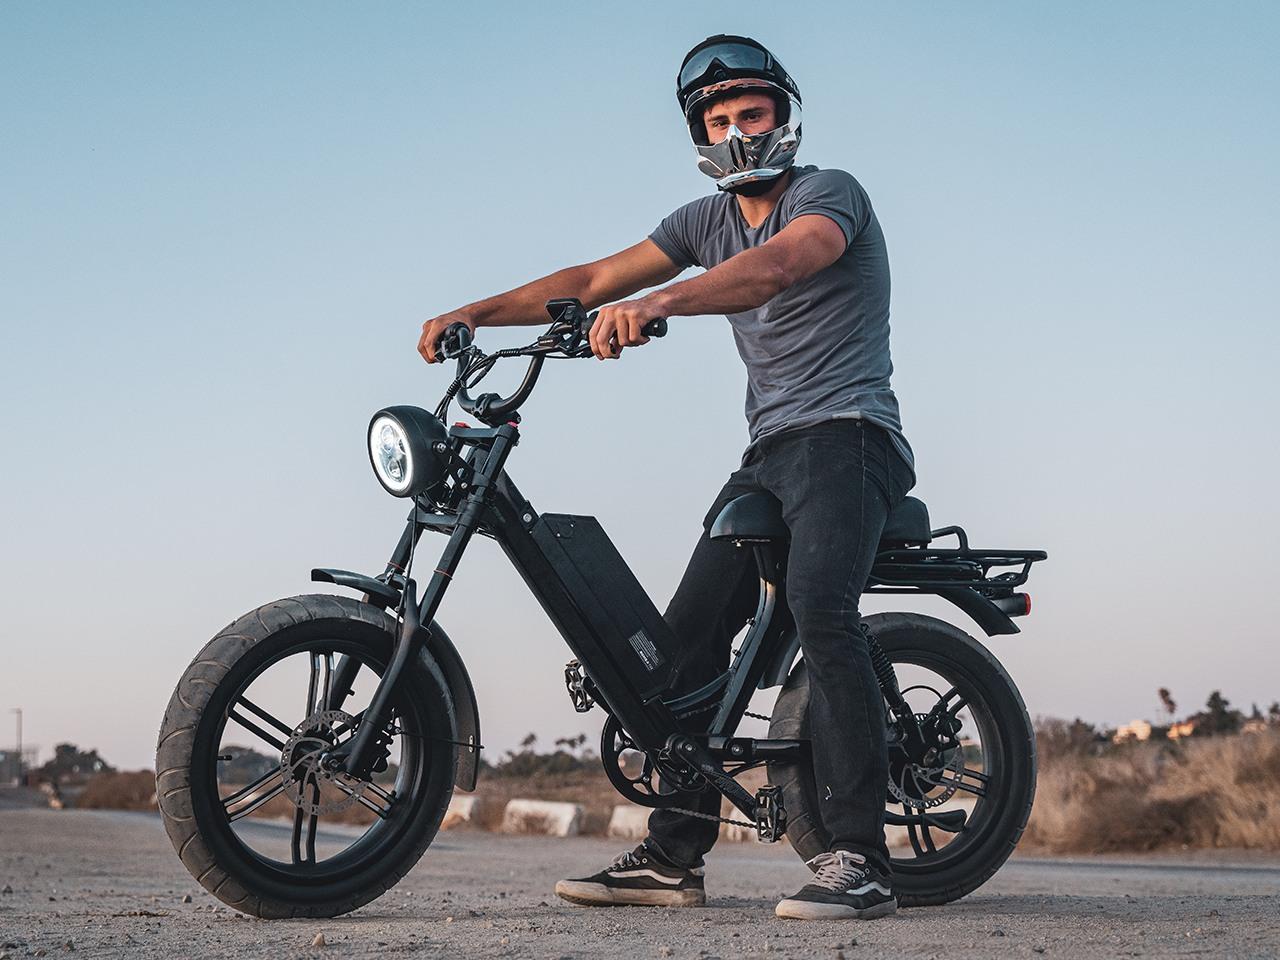 Juiced SCORPION : Moped Meets E-Bike   Indiegogo